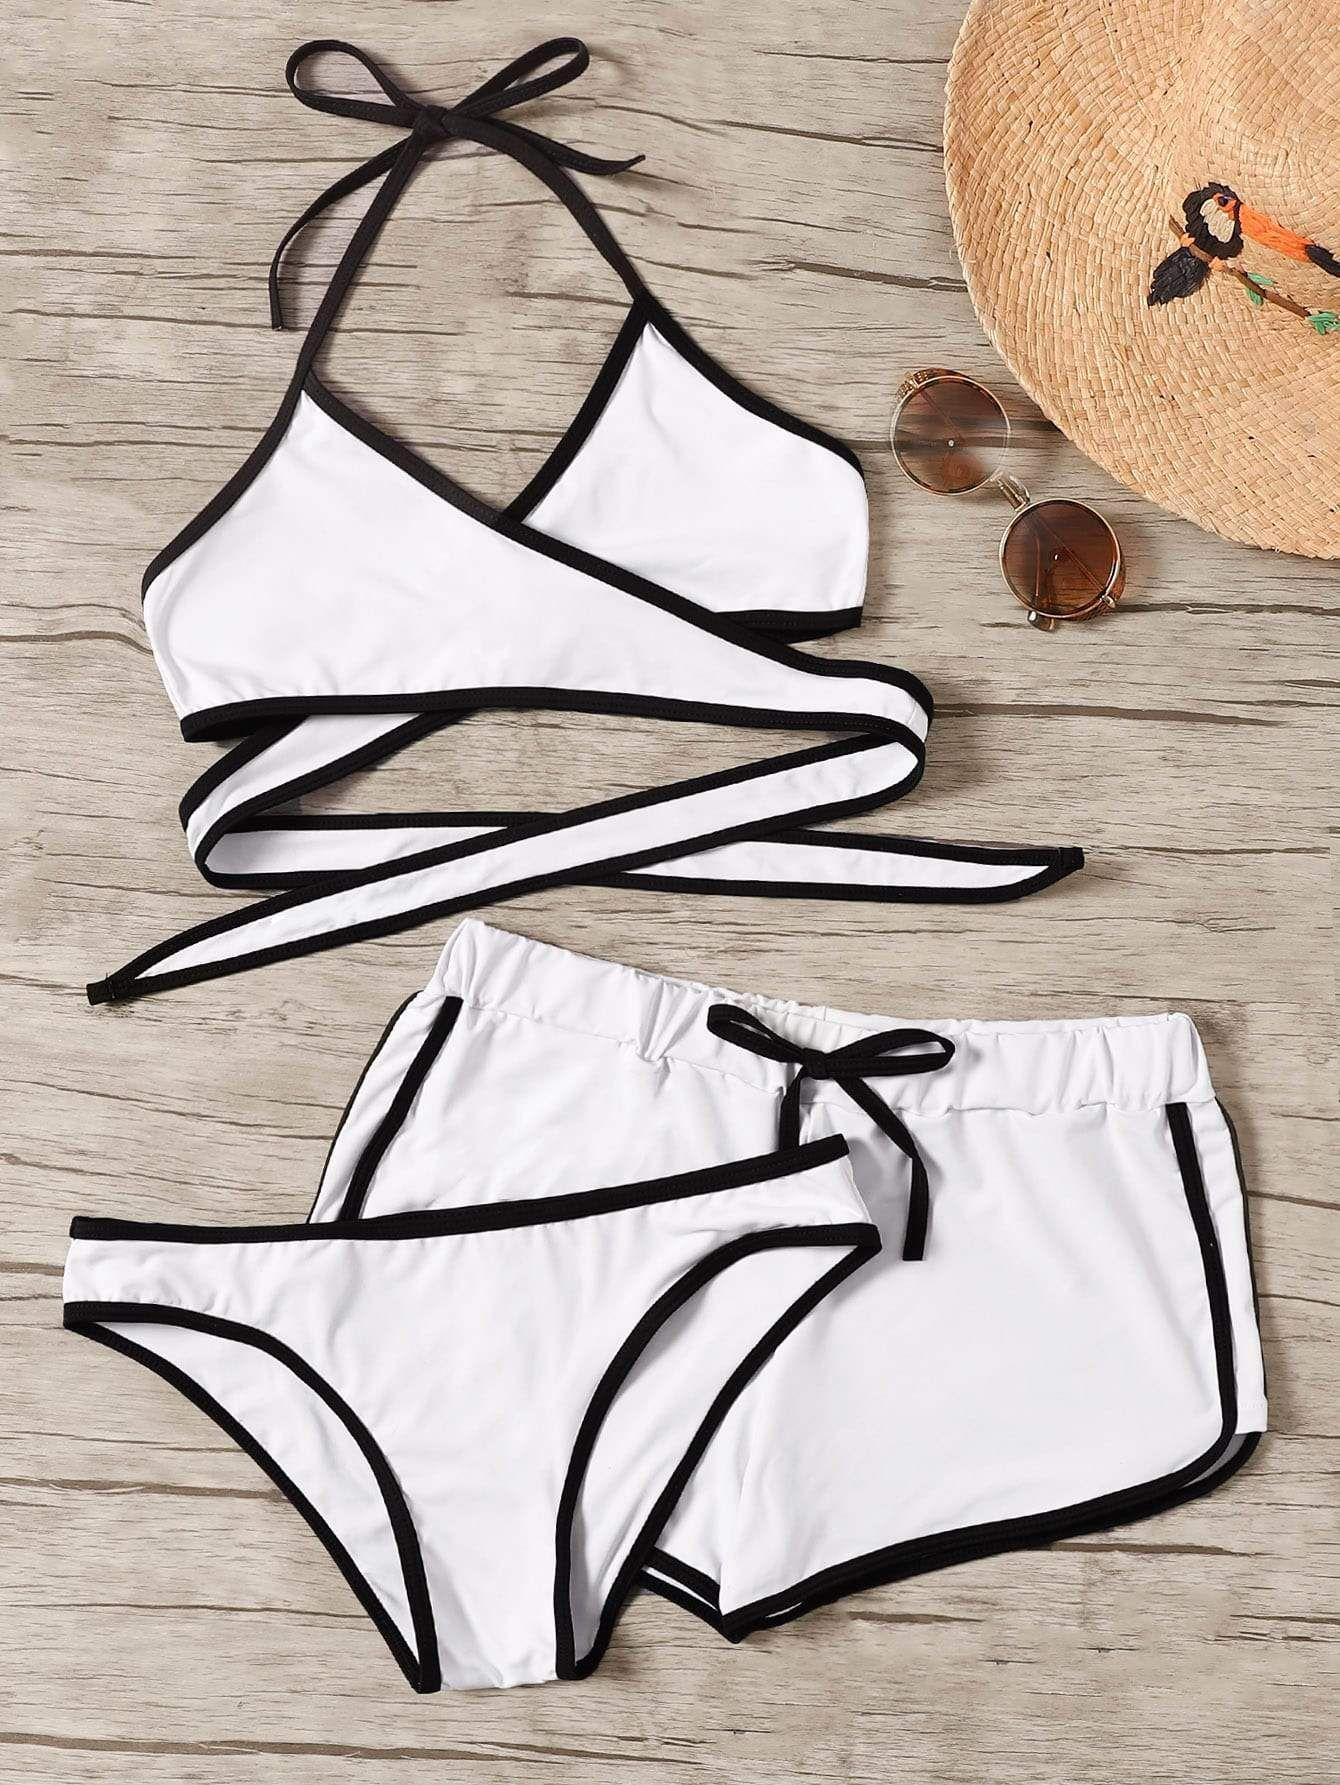 adae963800d1 Contrast Piping Wrap Halter Bikini Set 3pack - Popviva #swimwear  #sportswear #monokini #